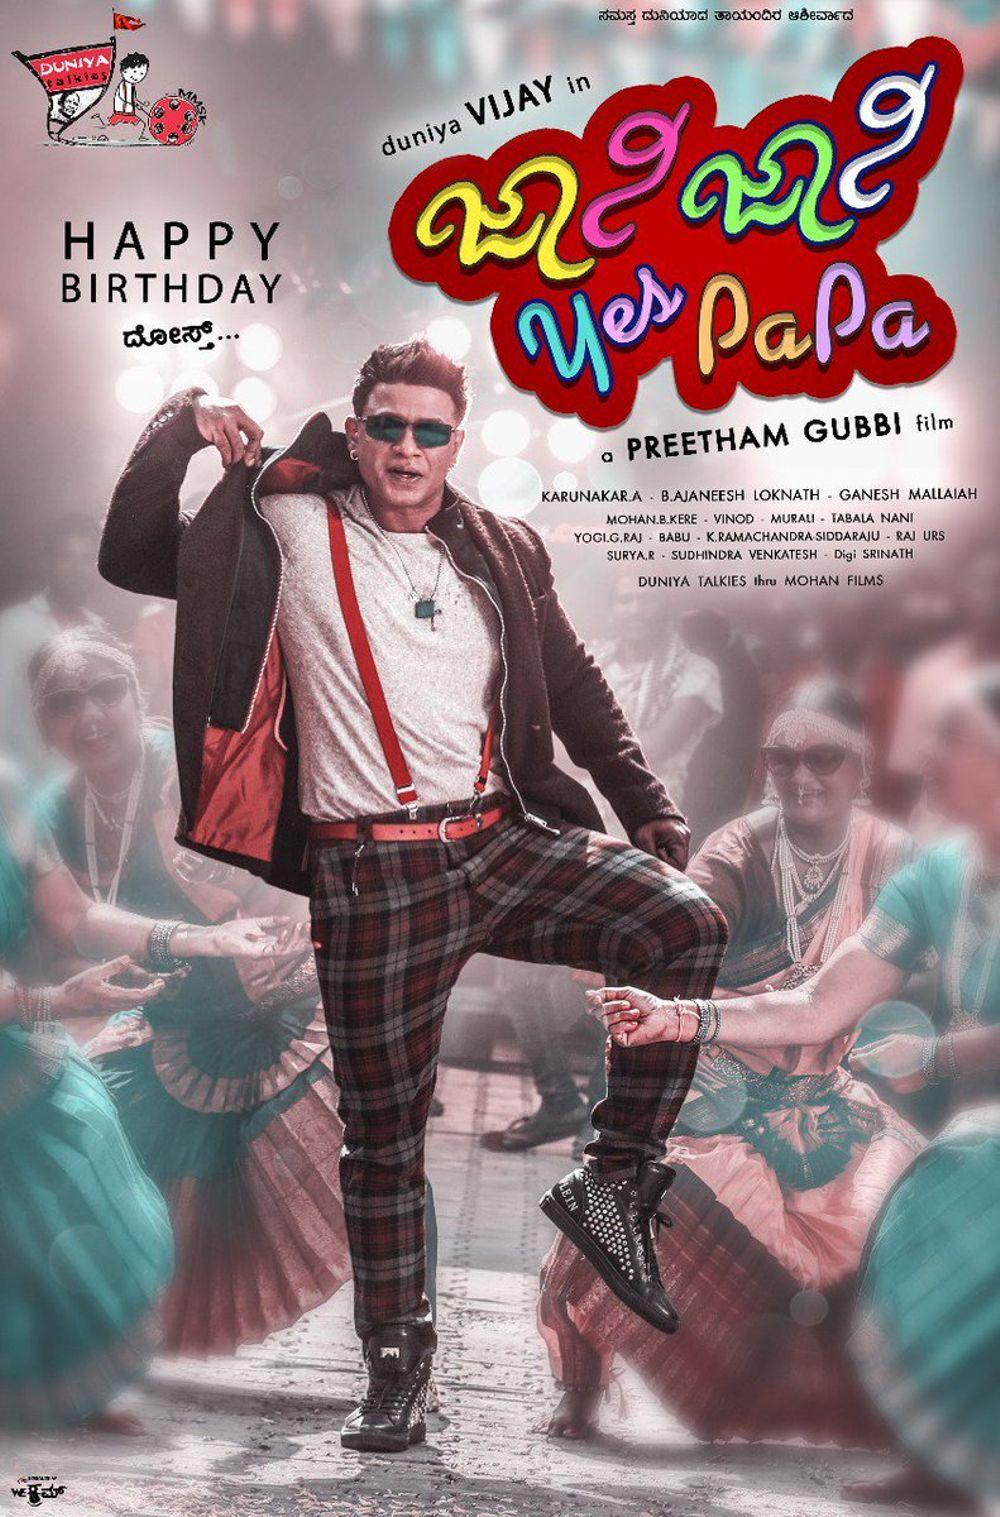 Johnny Johnny Yes Papa Movie Review